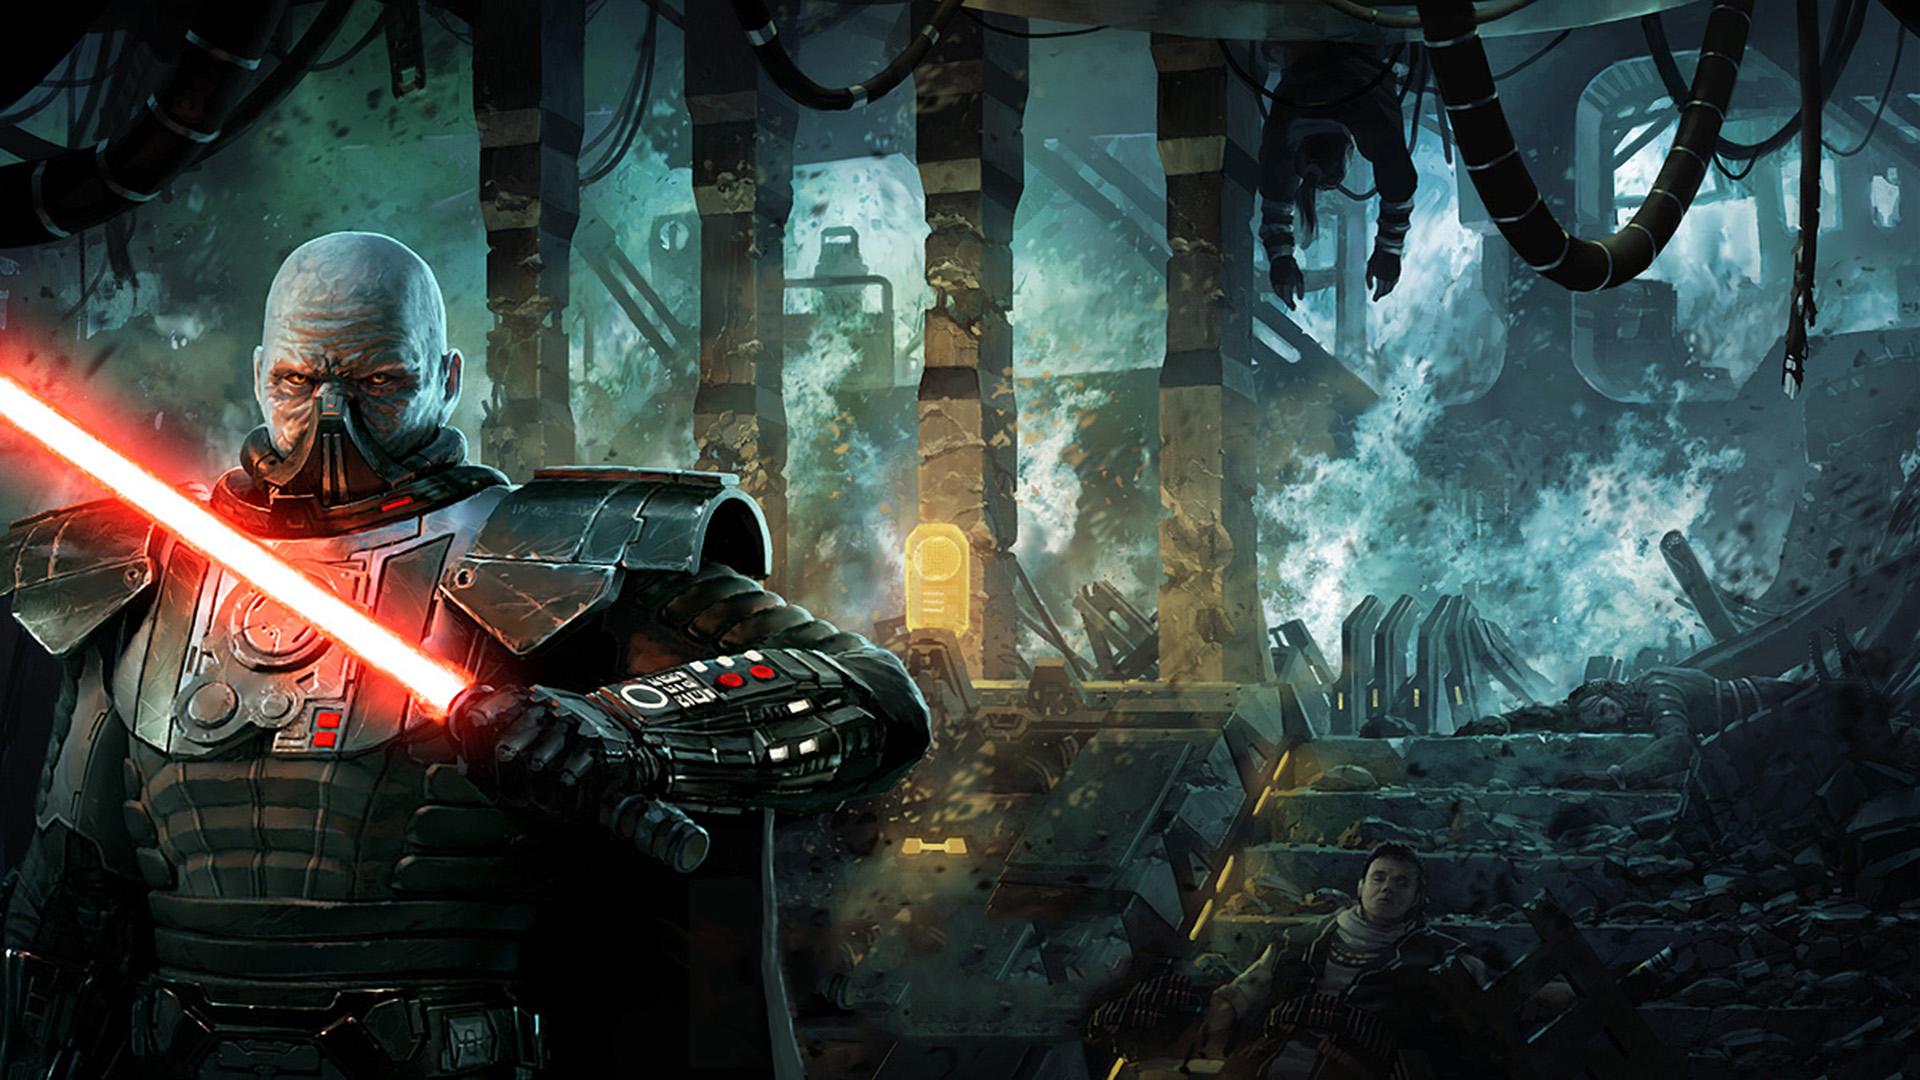 Star Wars The Old Republic Fondo De Pantalla Hd Fondo De